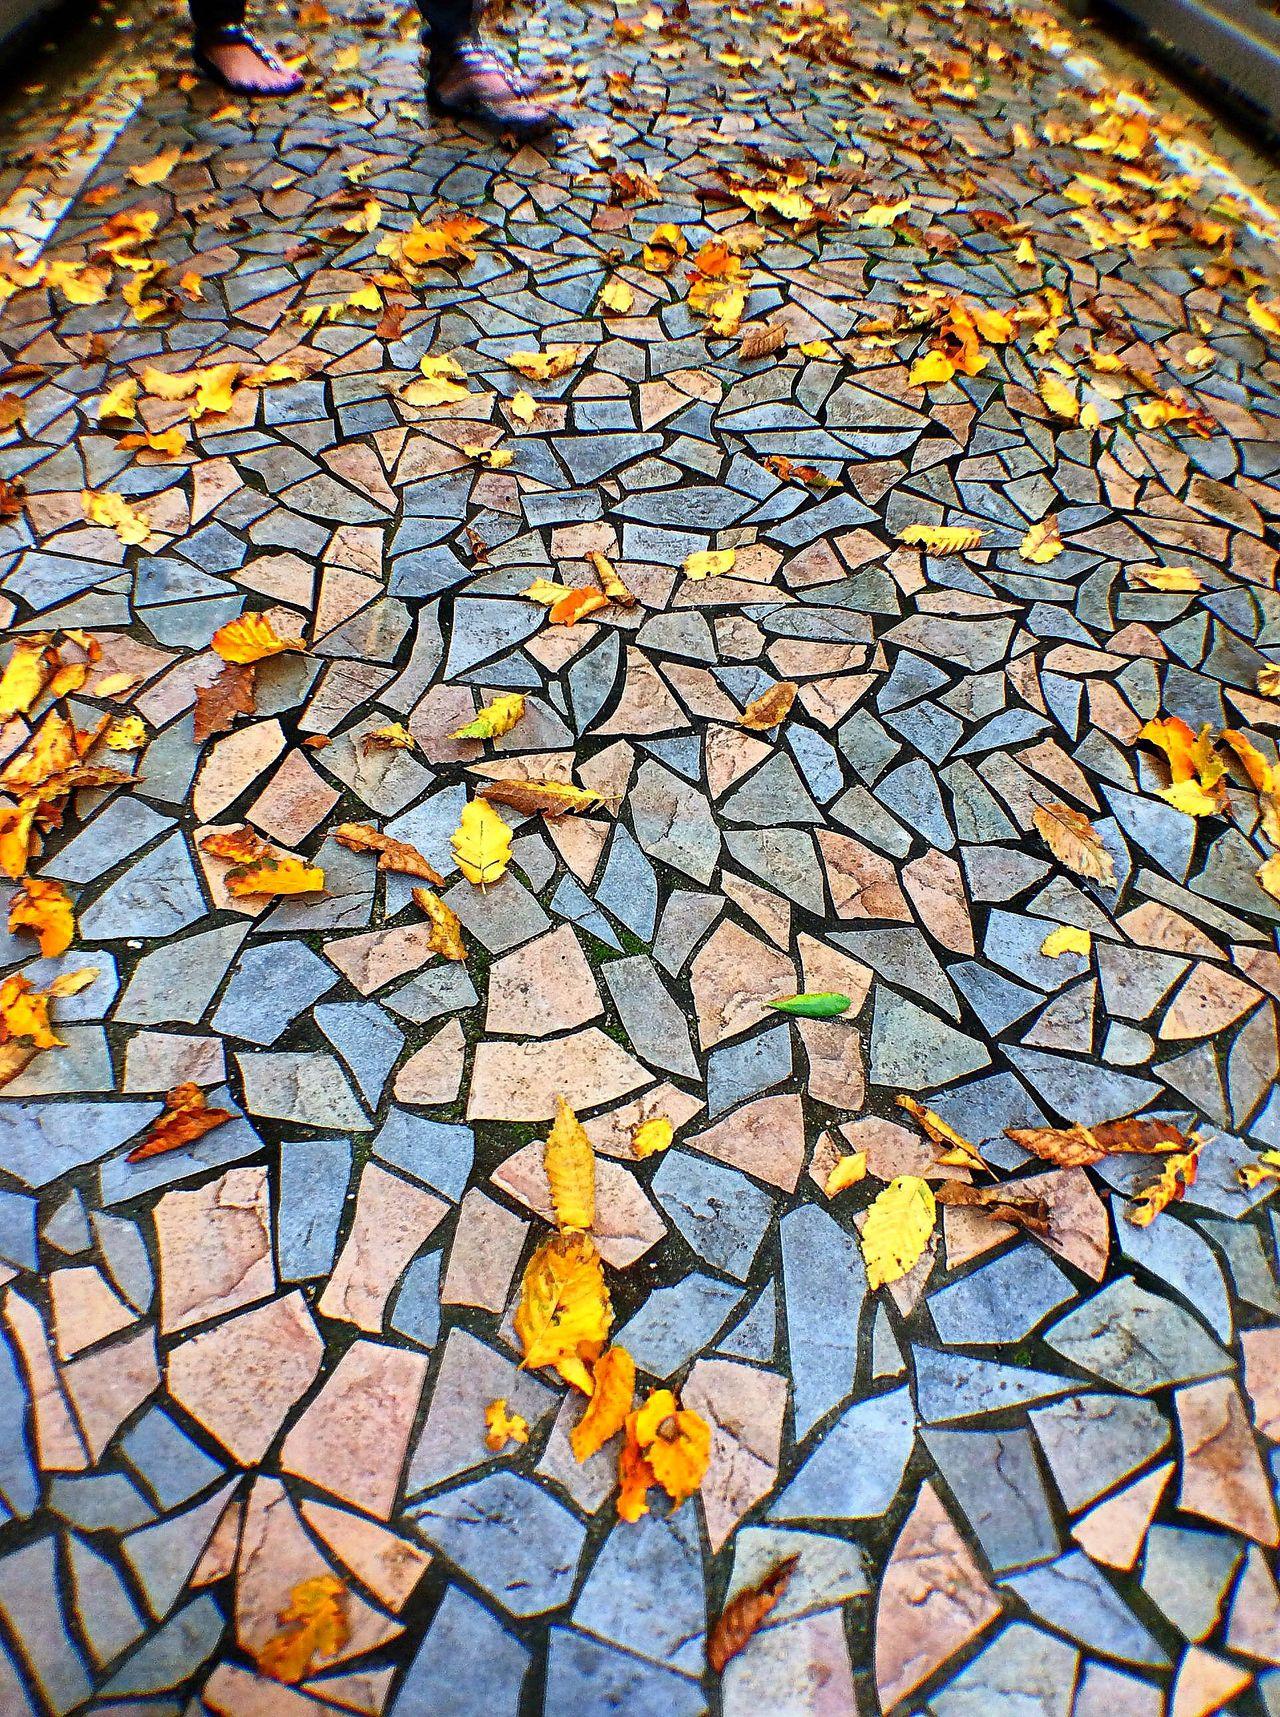 The Global EyeEm Adventure Waikato Hamilton Gardens Hamiltongardens Tiles New Zealand Fall Leaves EEA3_CambridgeNZ EEA3 Ipadphotography Olloclip Pattern Pieces